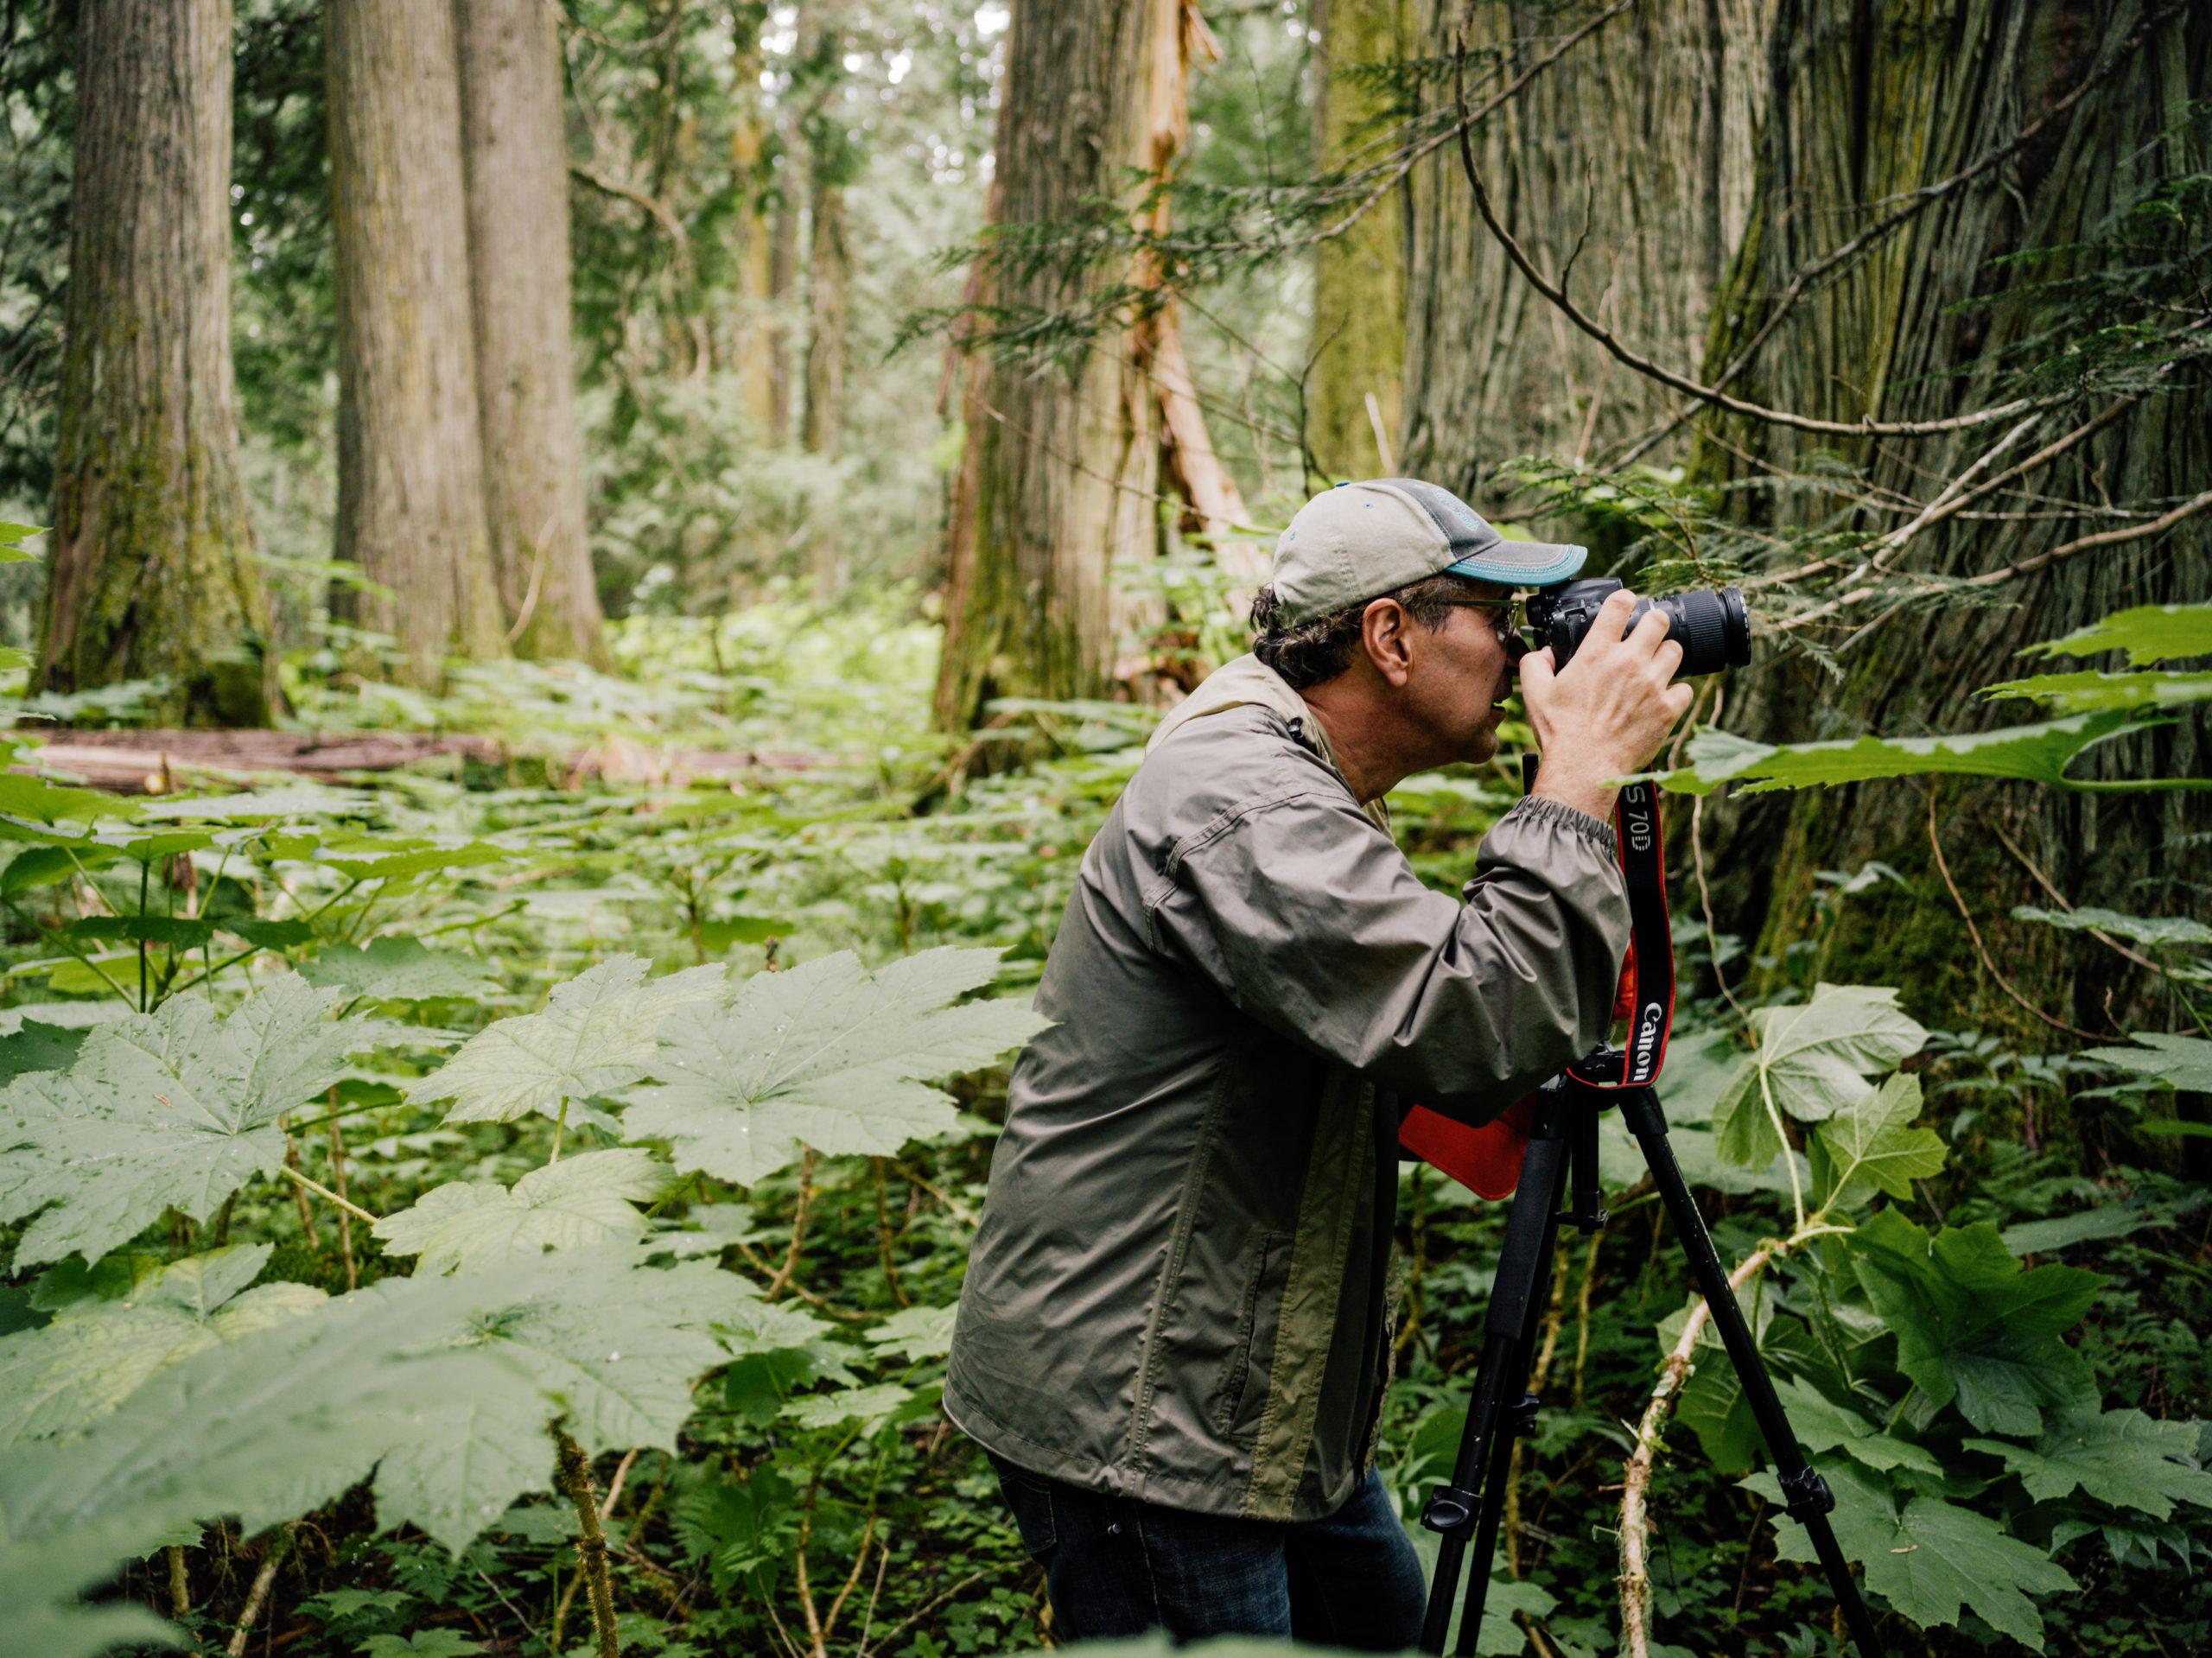 Dominick DellaSala The Narwhal Canada's Forgotten Rainforest Taylor Roades